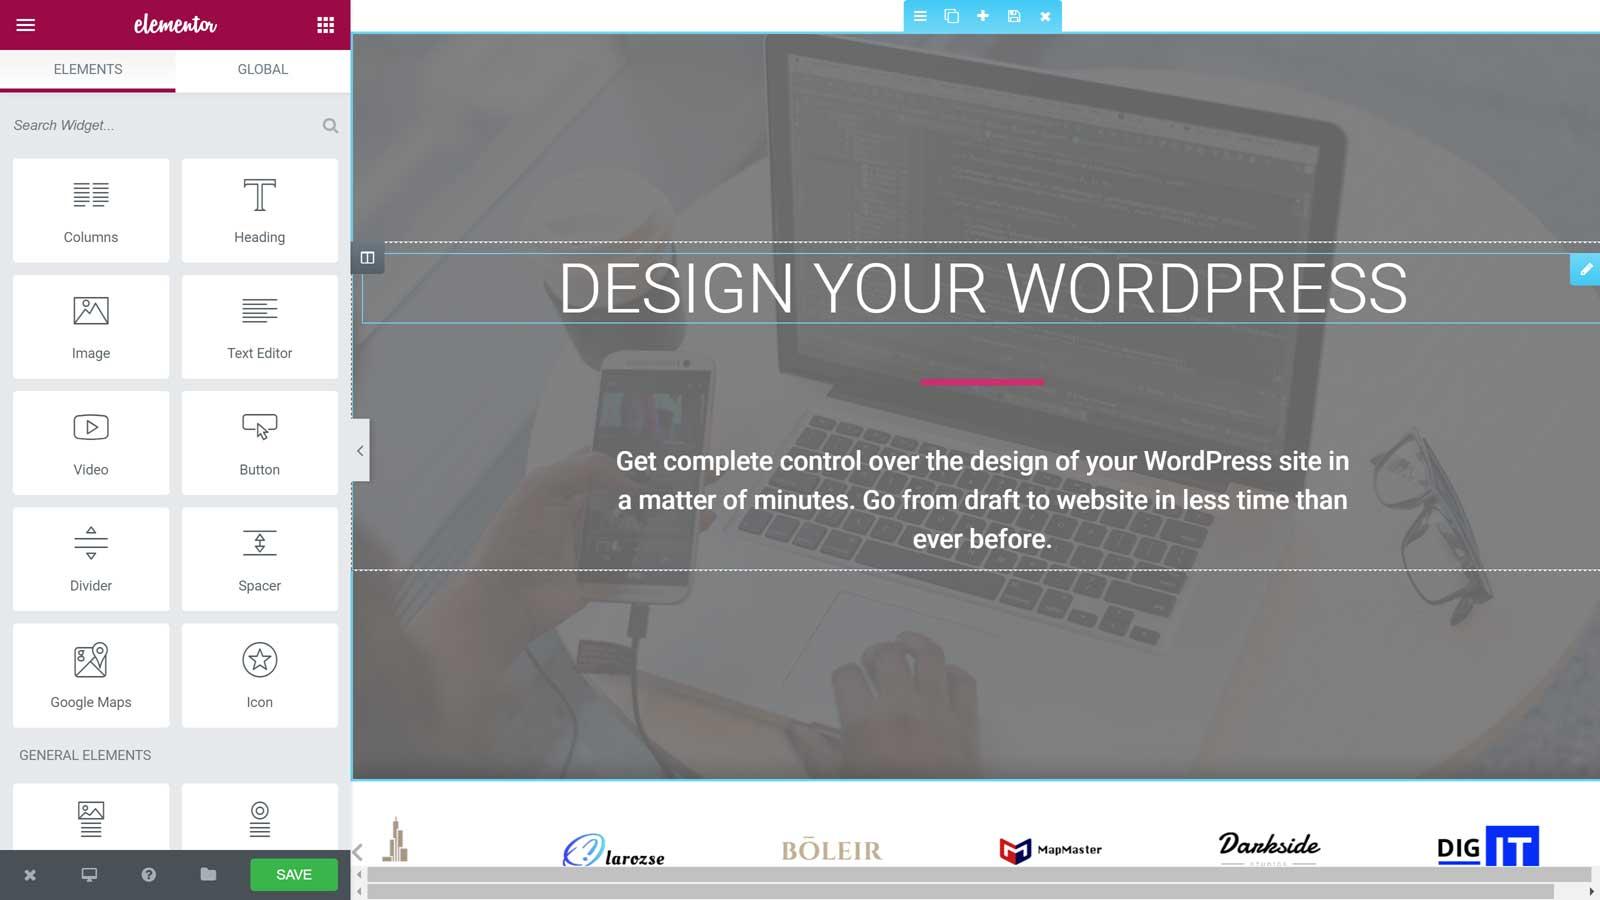 elementor - צילום מסך של הממשק